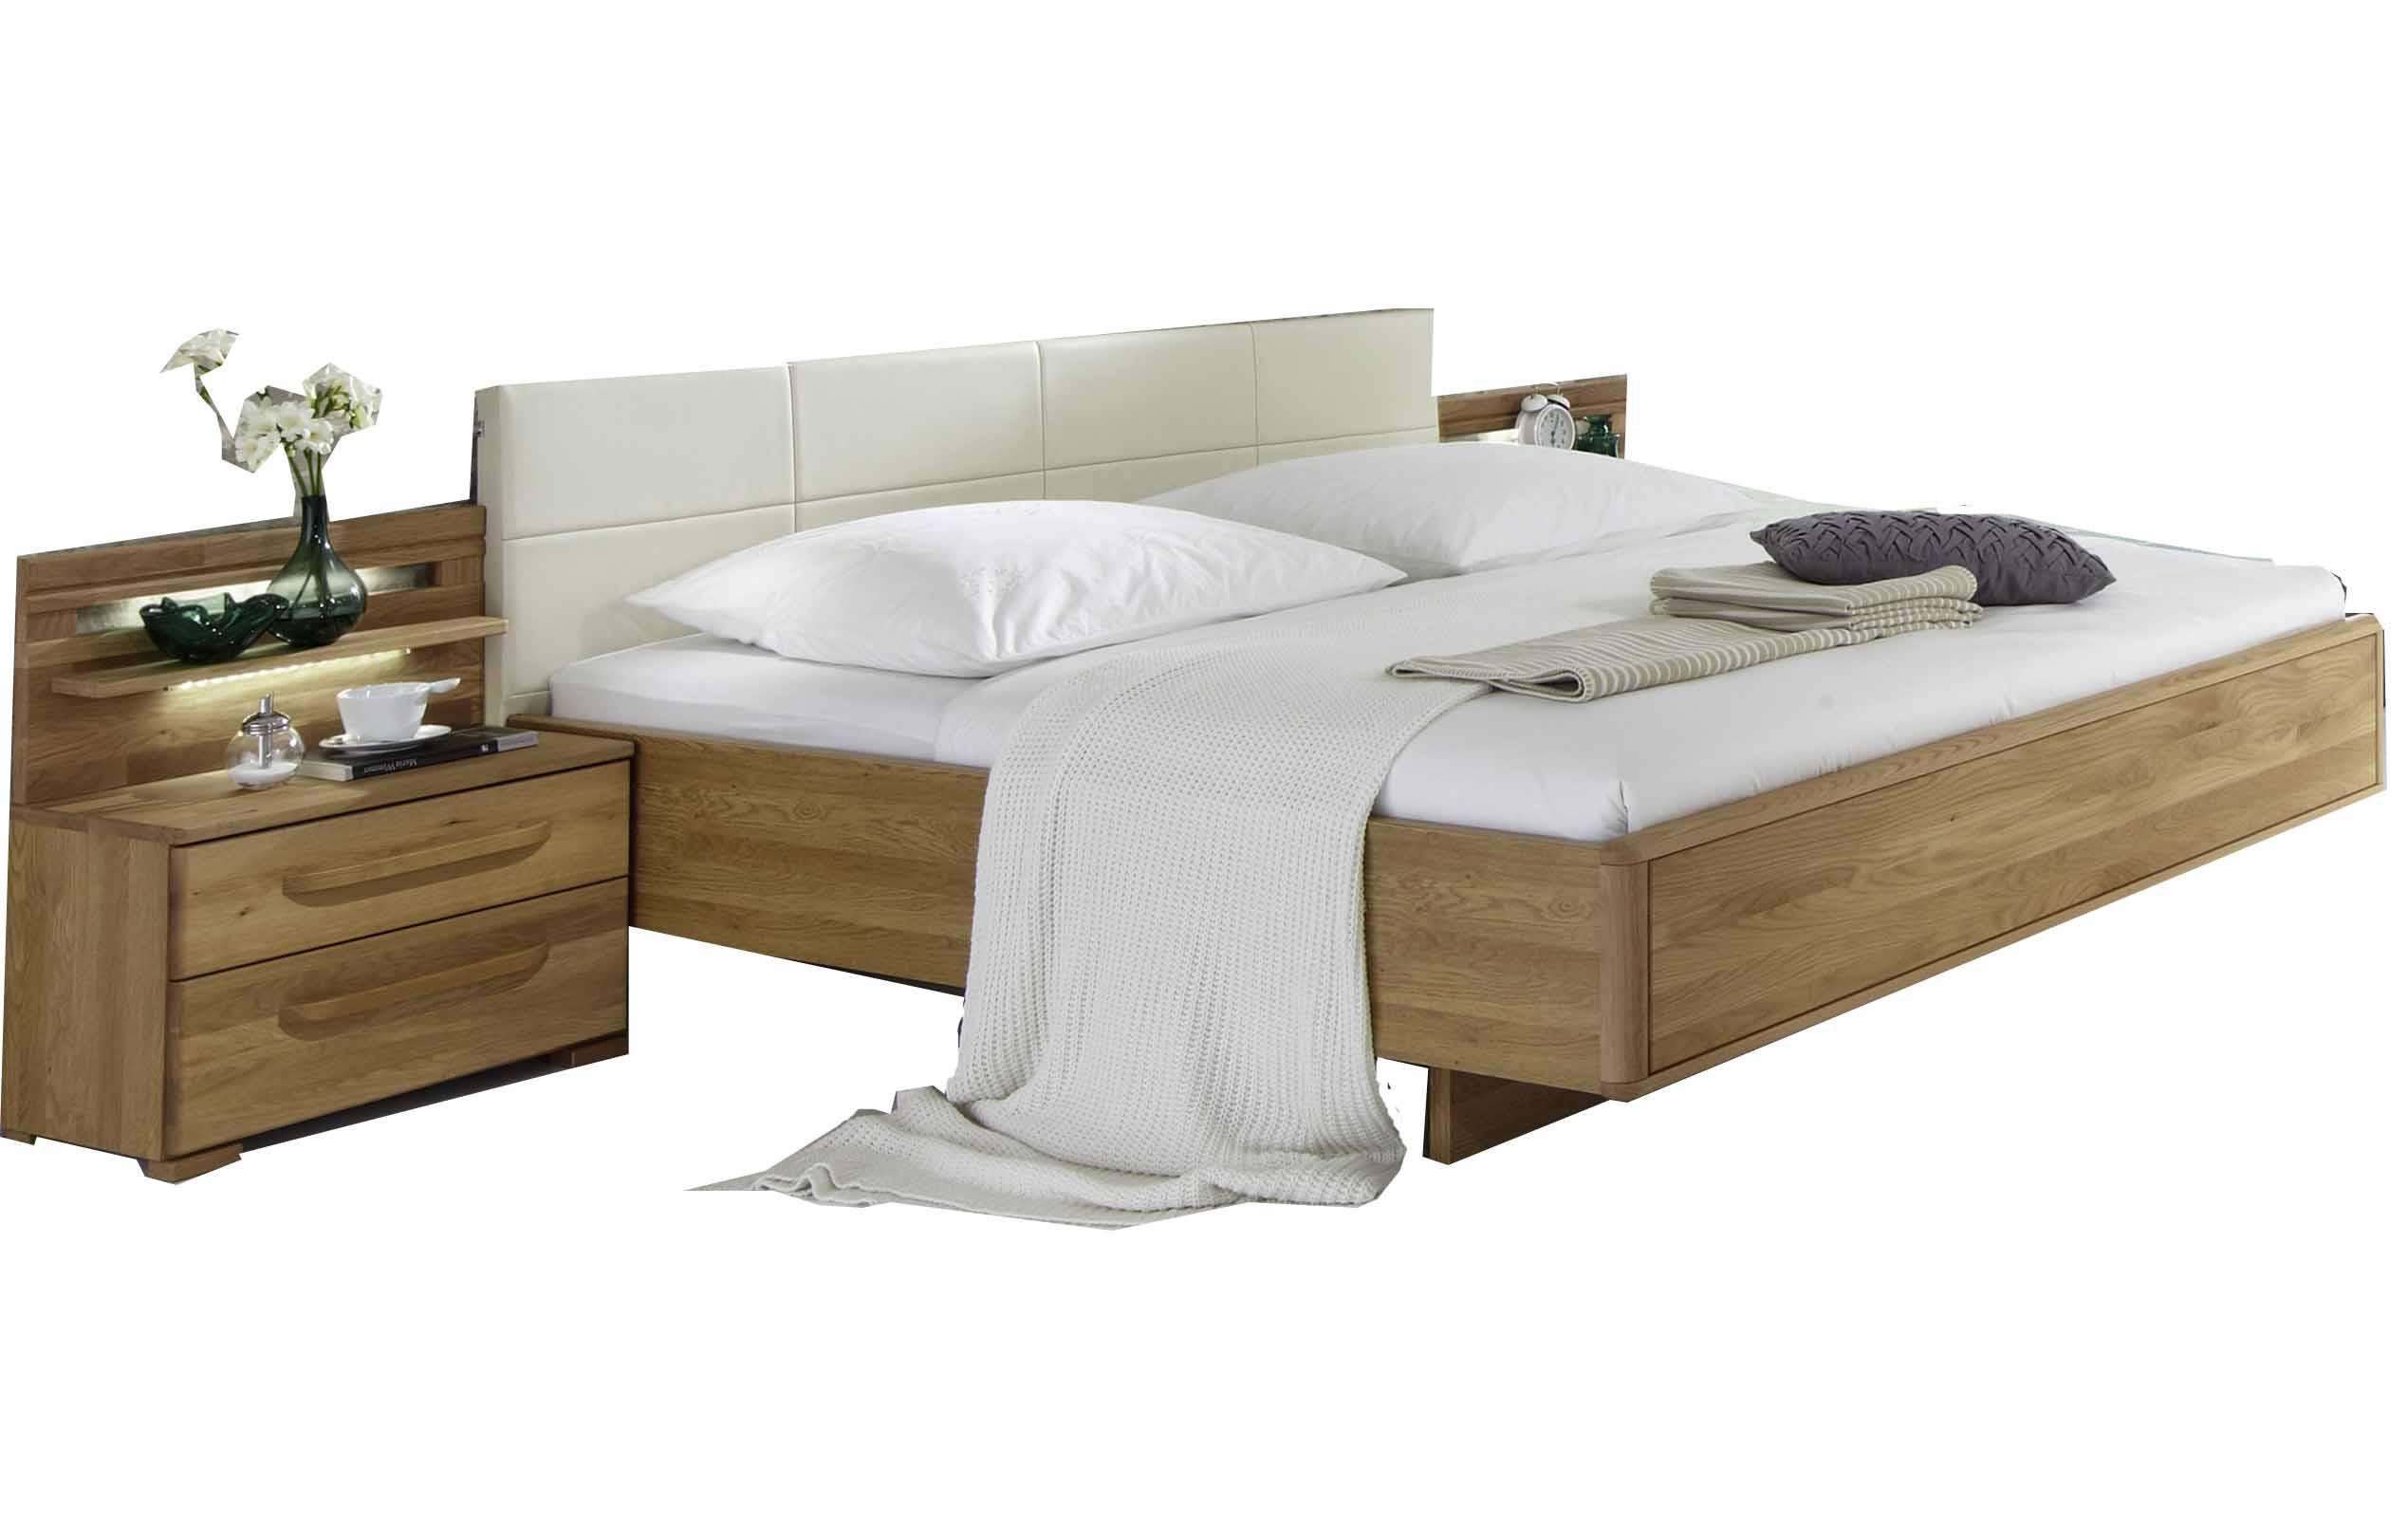 wiemann bett torino eiche teilmassiv massiva m. Black Bedroom Furniture Sets. Home Design Ideas